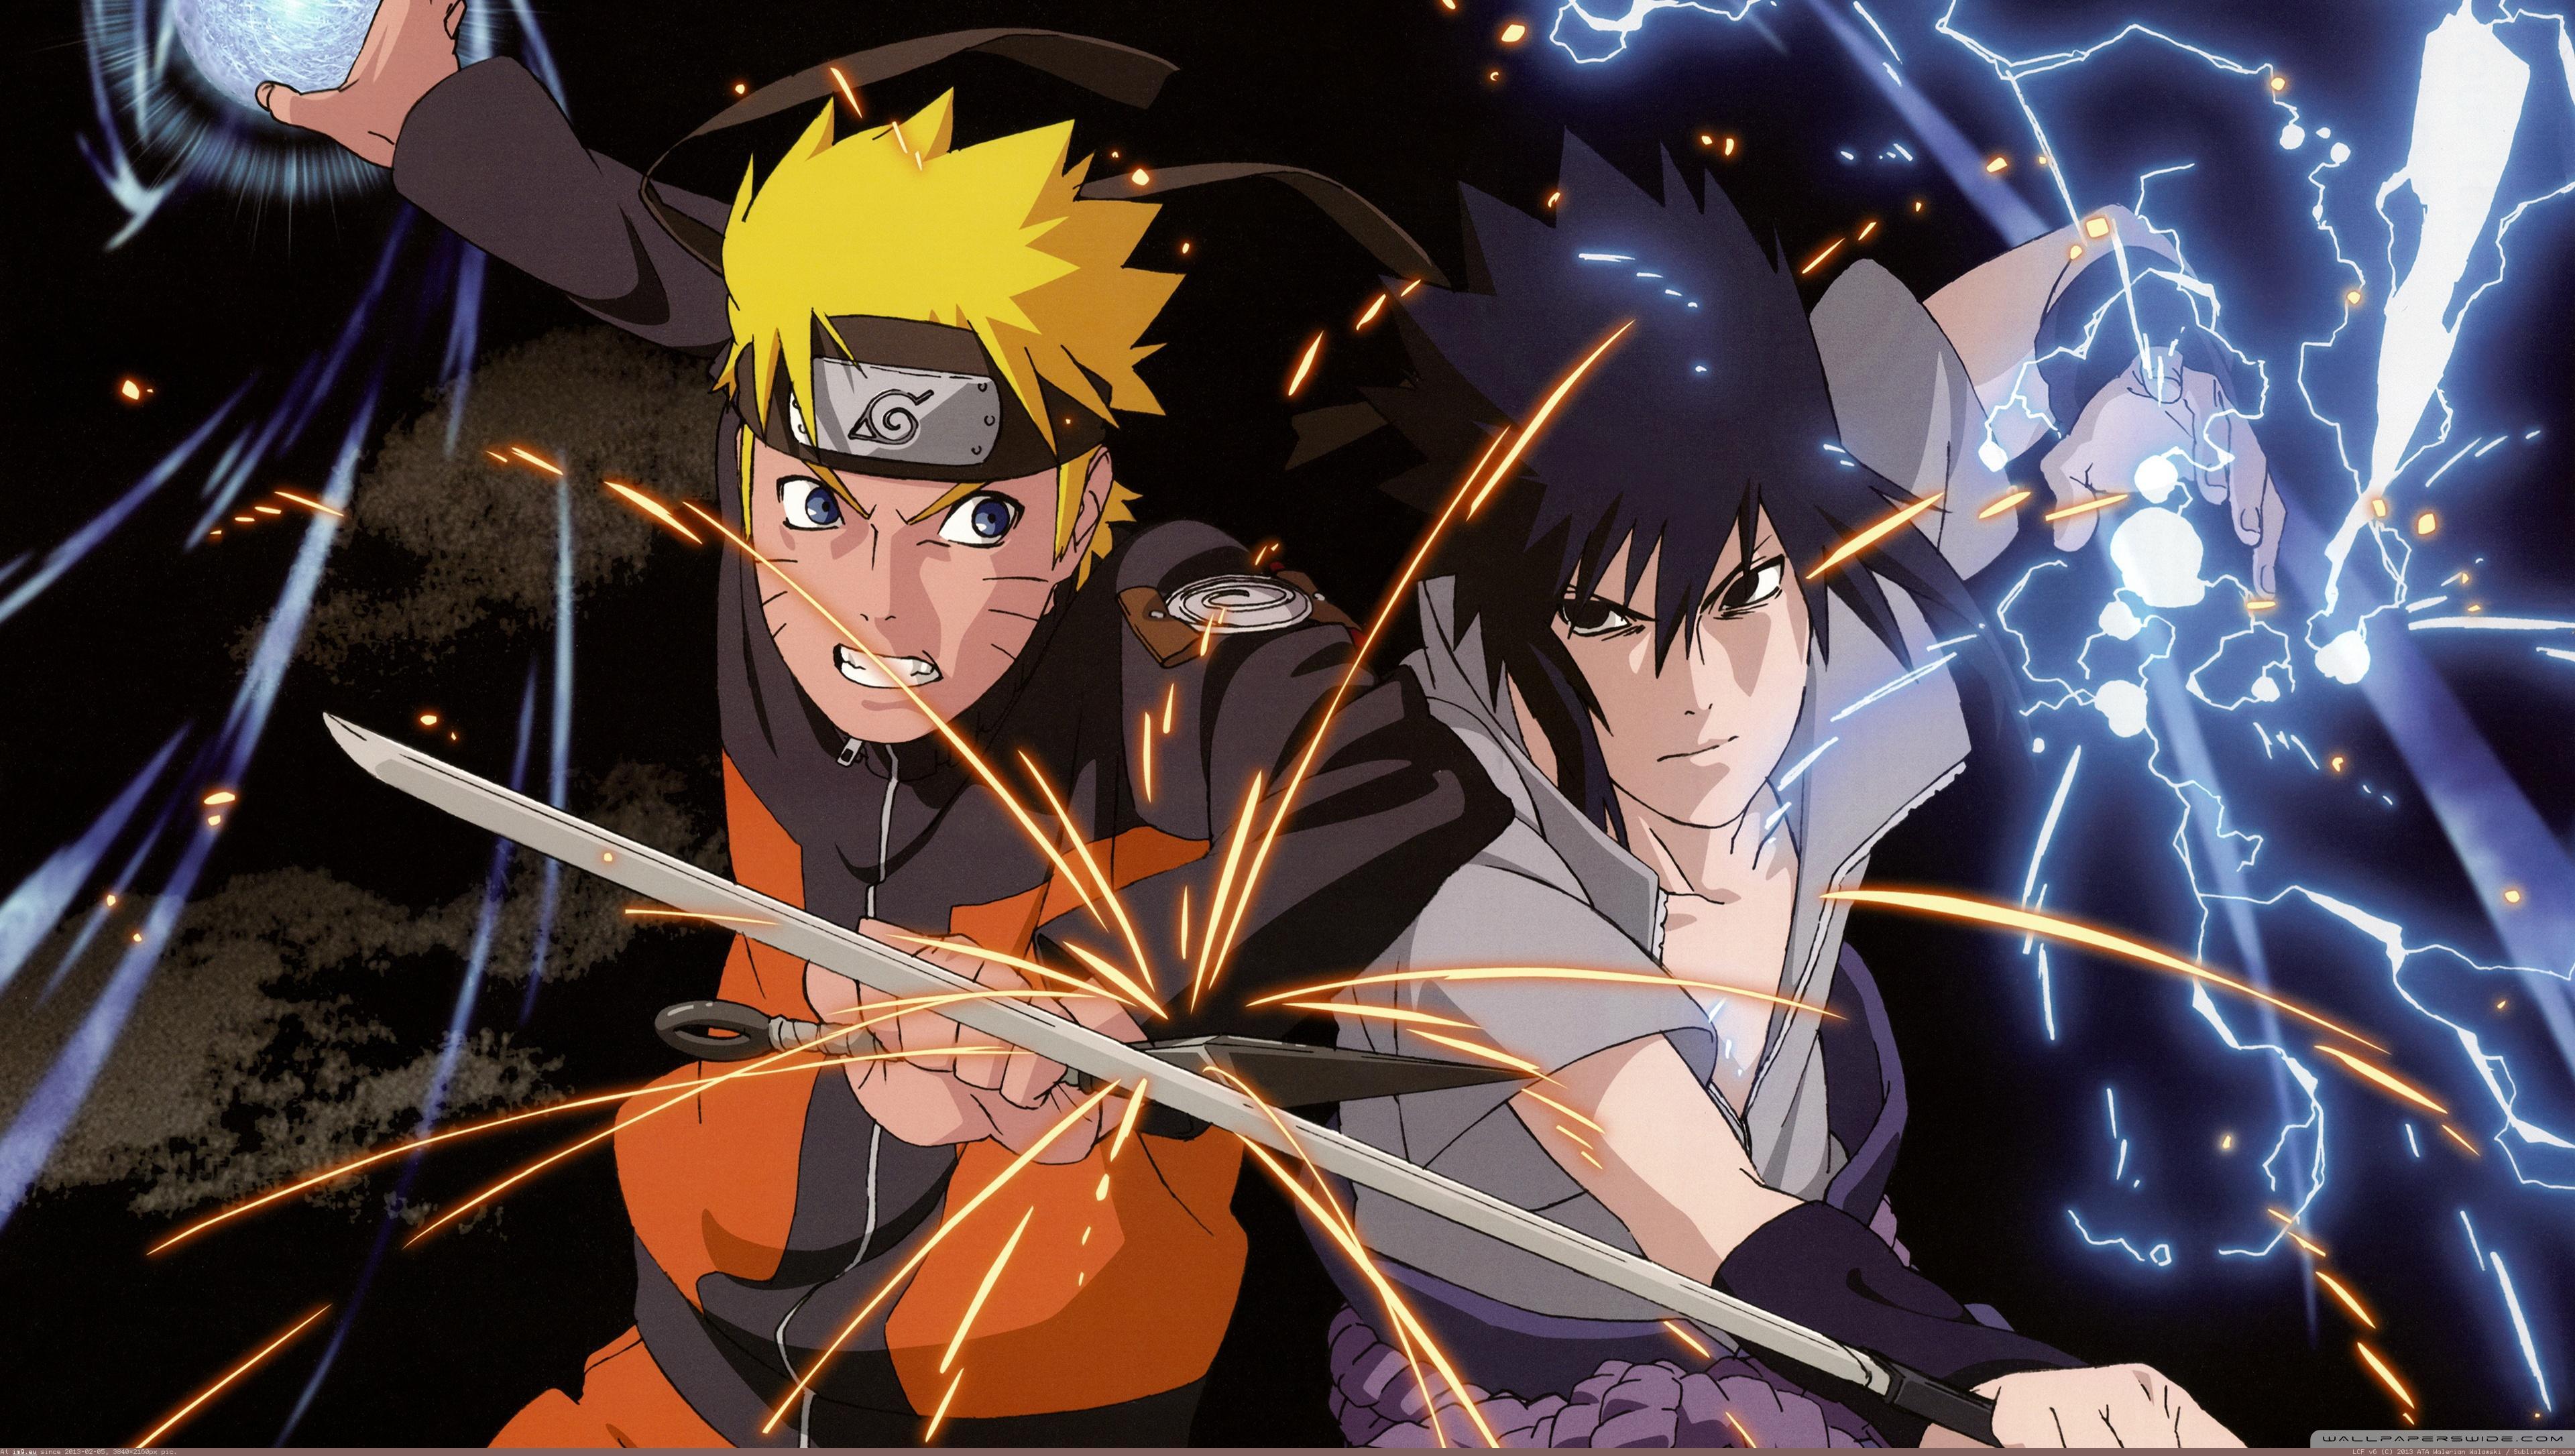 Background image vs img - Art 3d Backgrounds Naruto Vs Sasuke Wallpaper 3840x2160 Hd